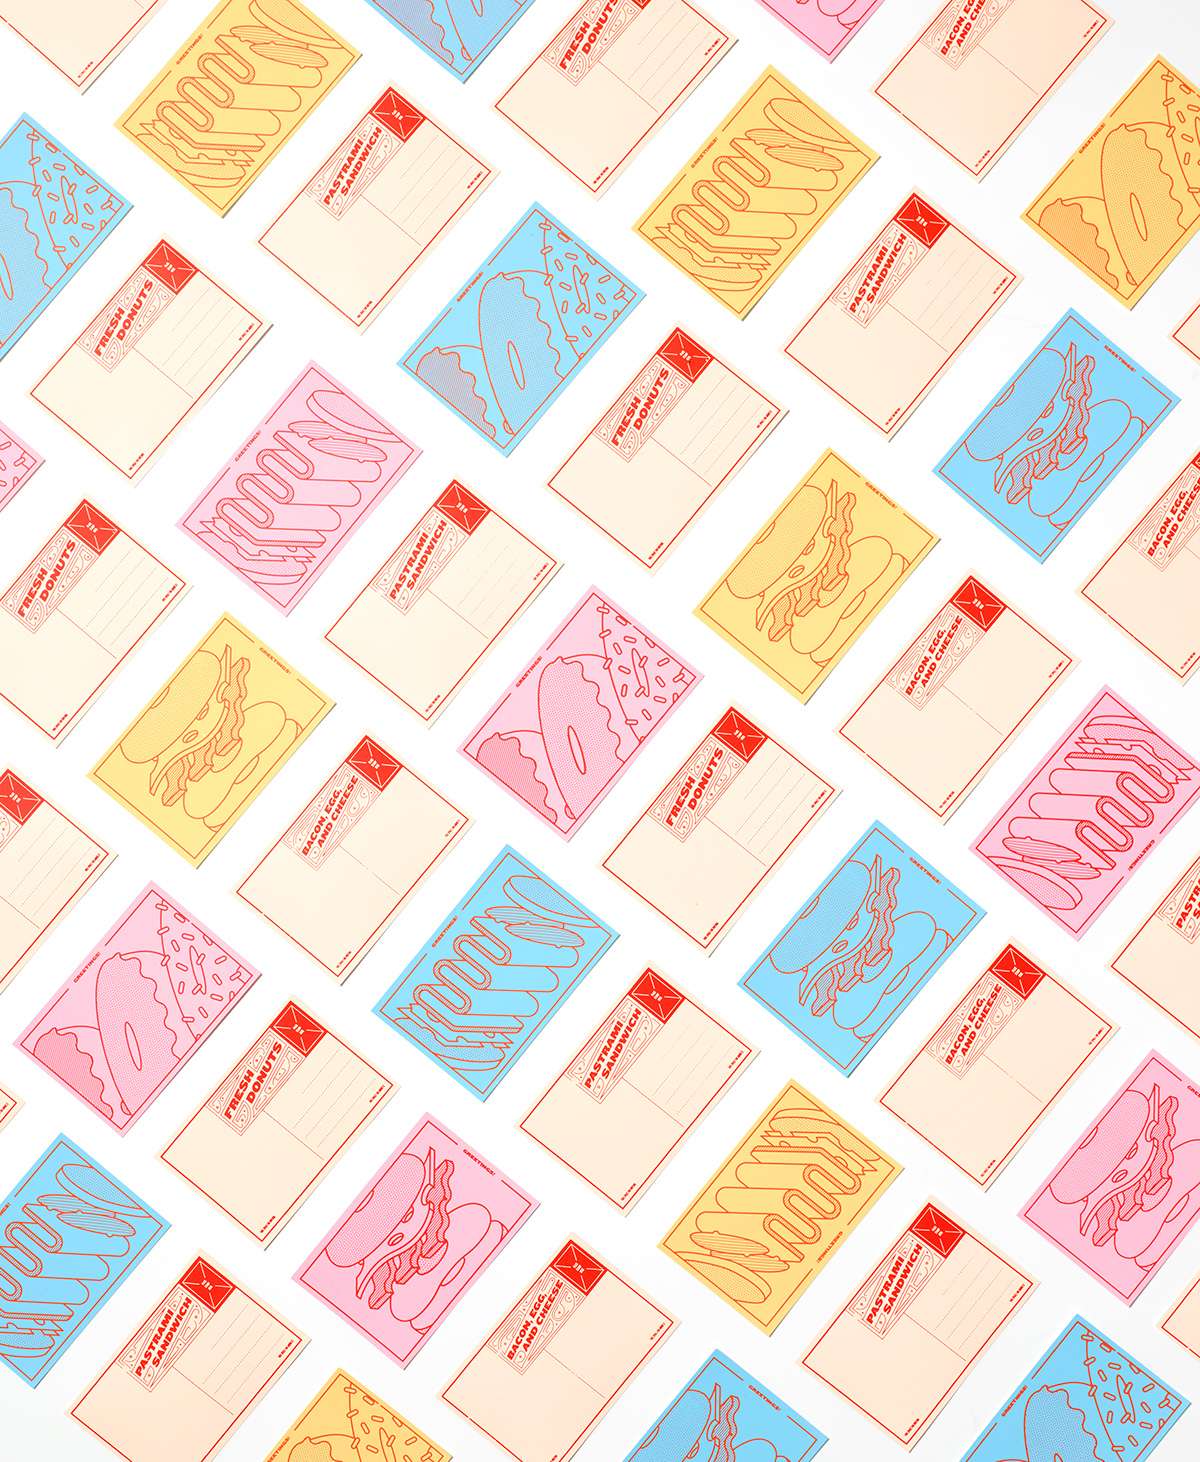 postcard post card silk screen print Printing Screenprinting sandwich type #Ps25Under25